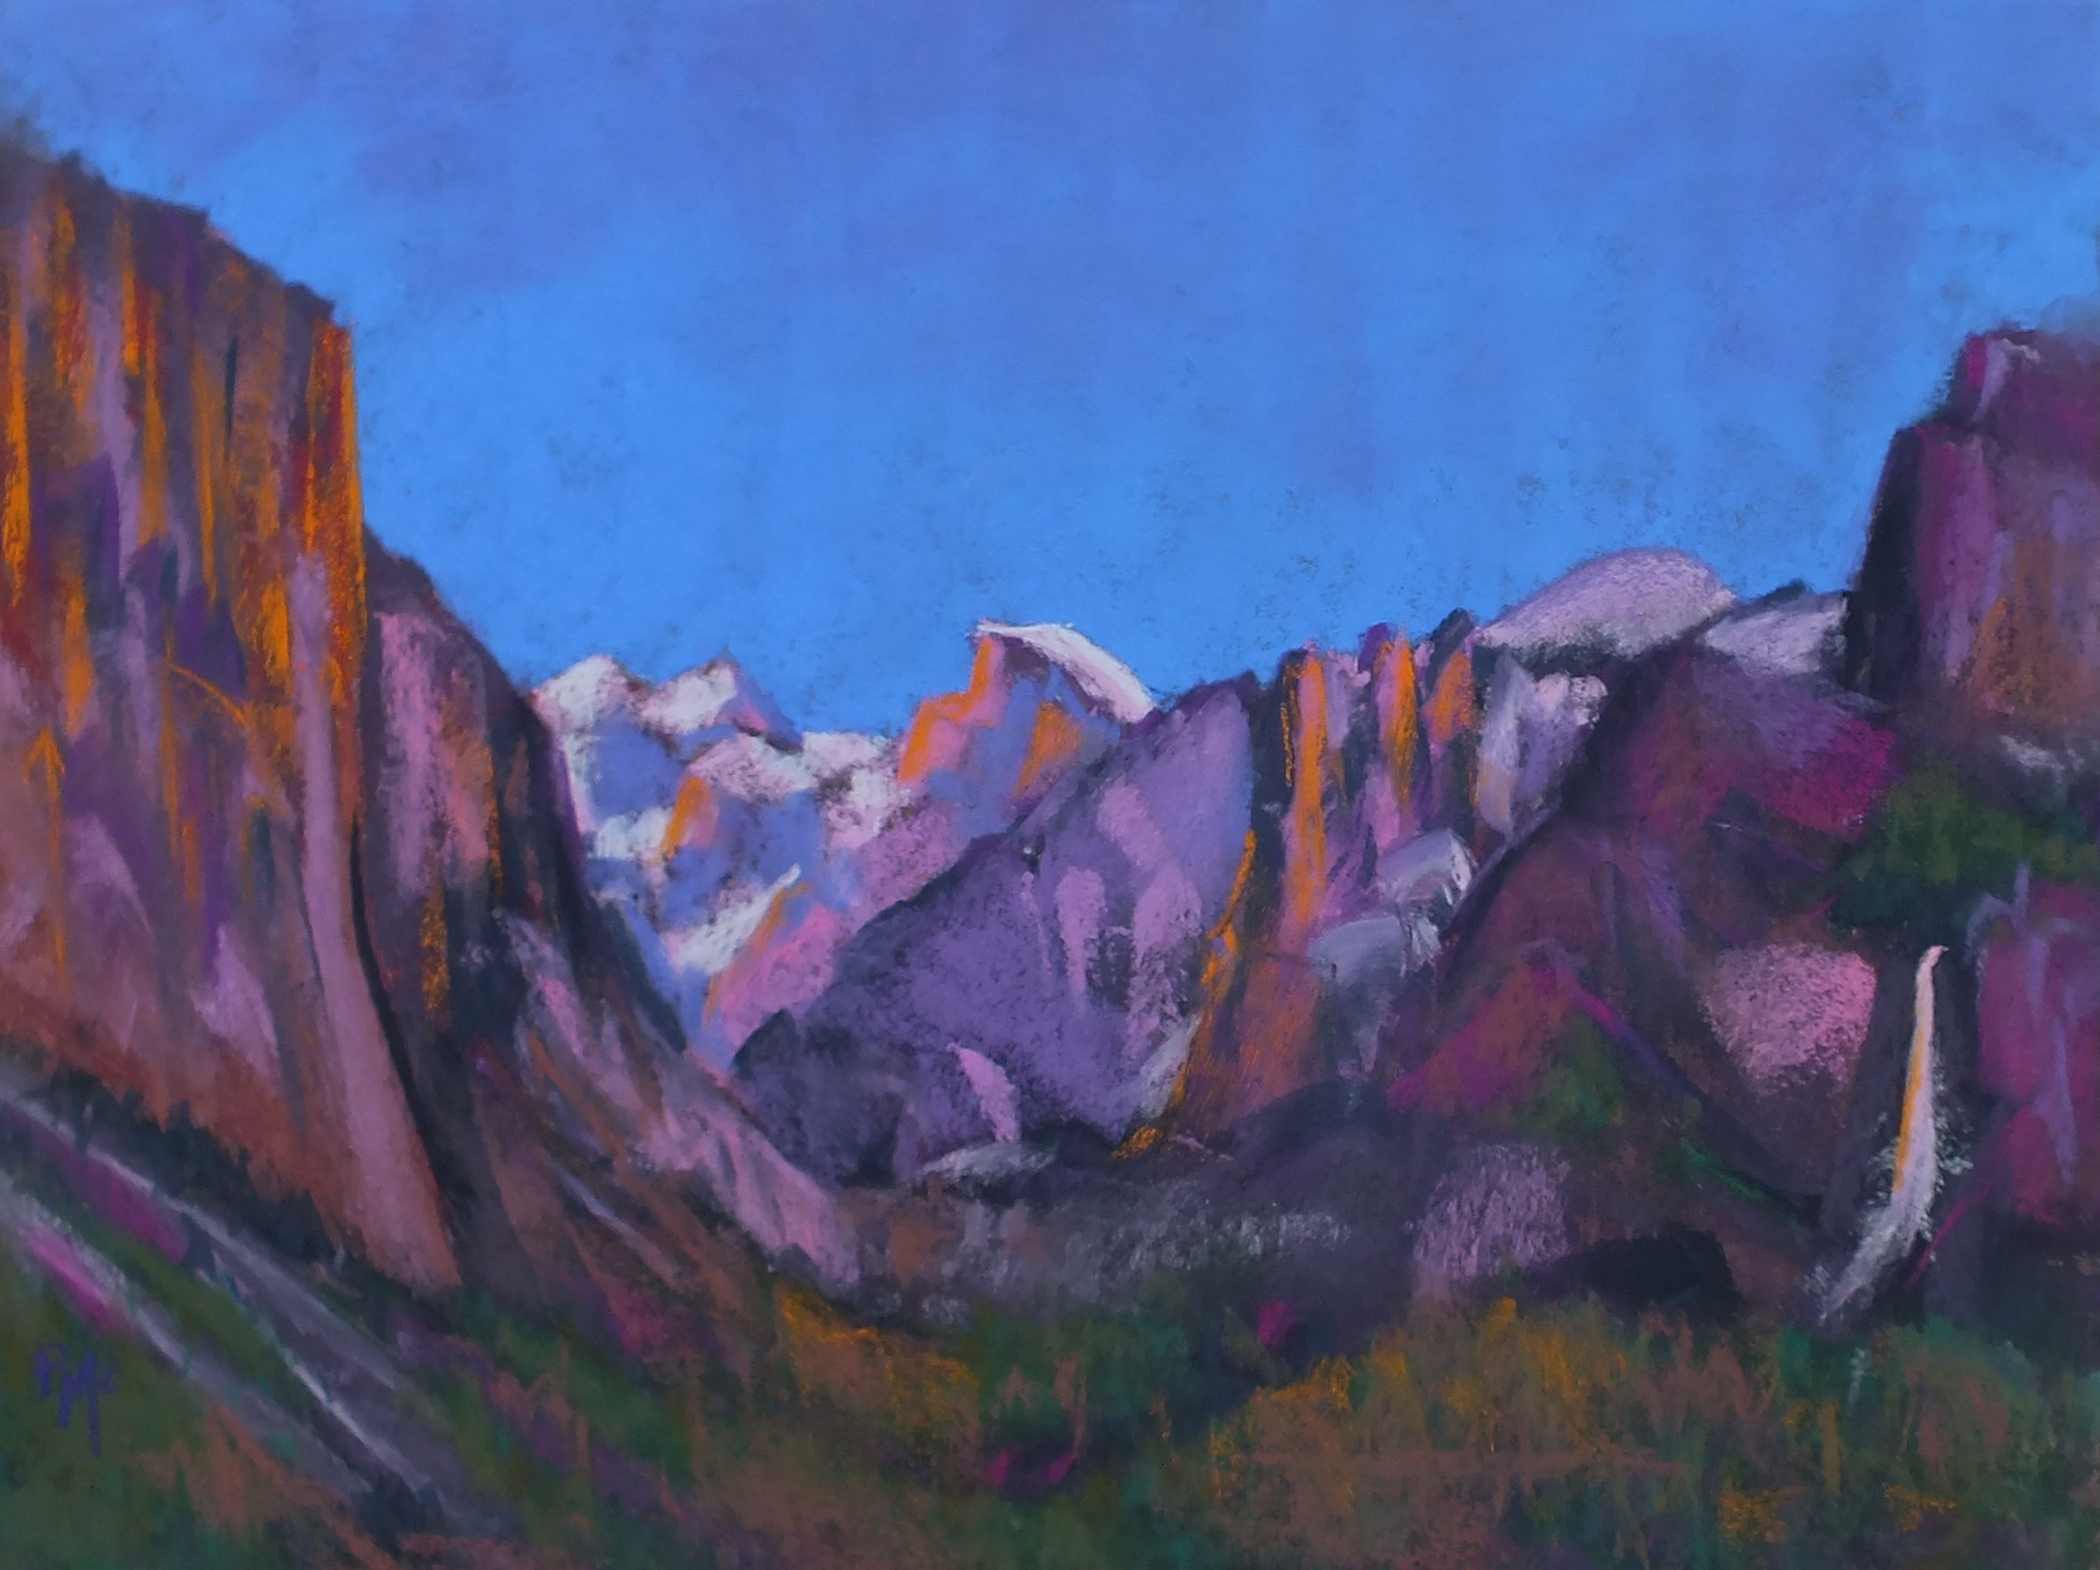 Evening Light in Yosemite